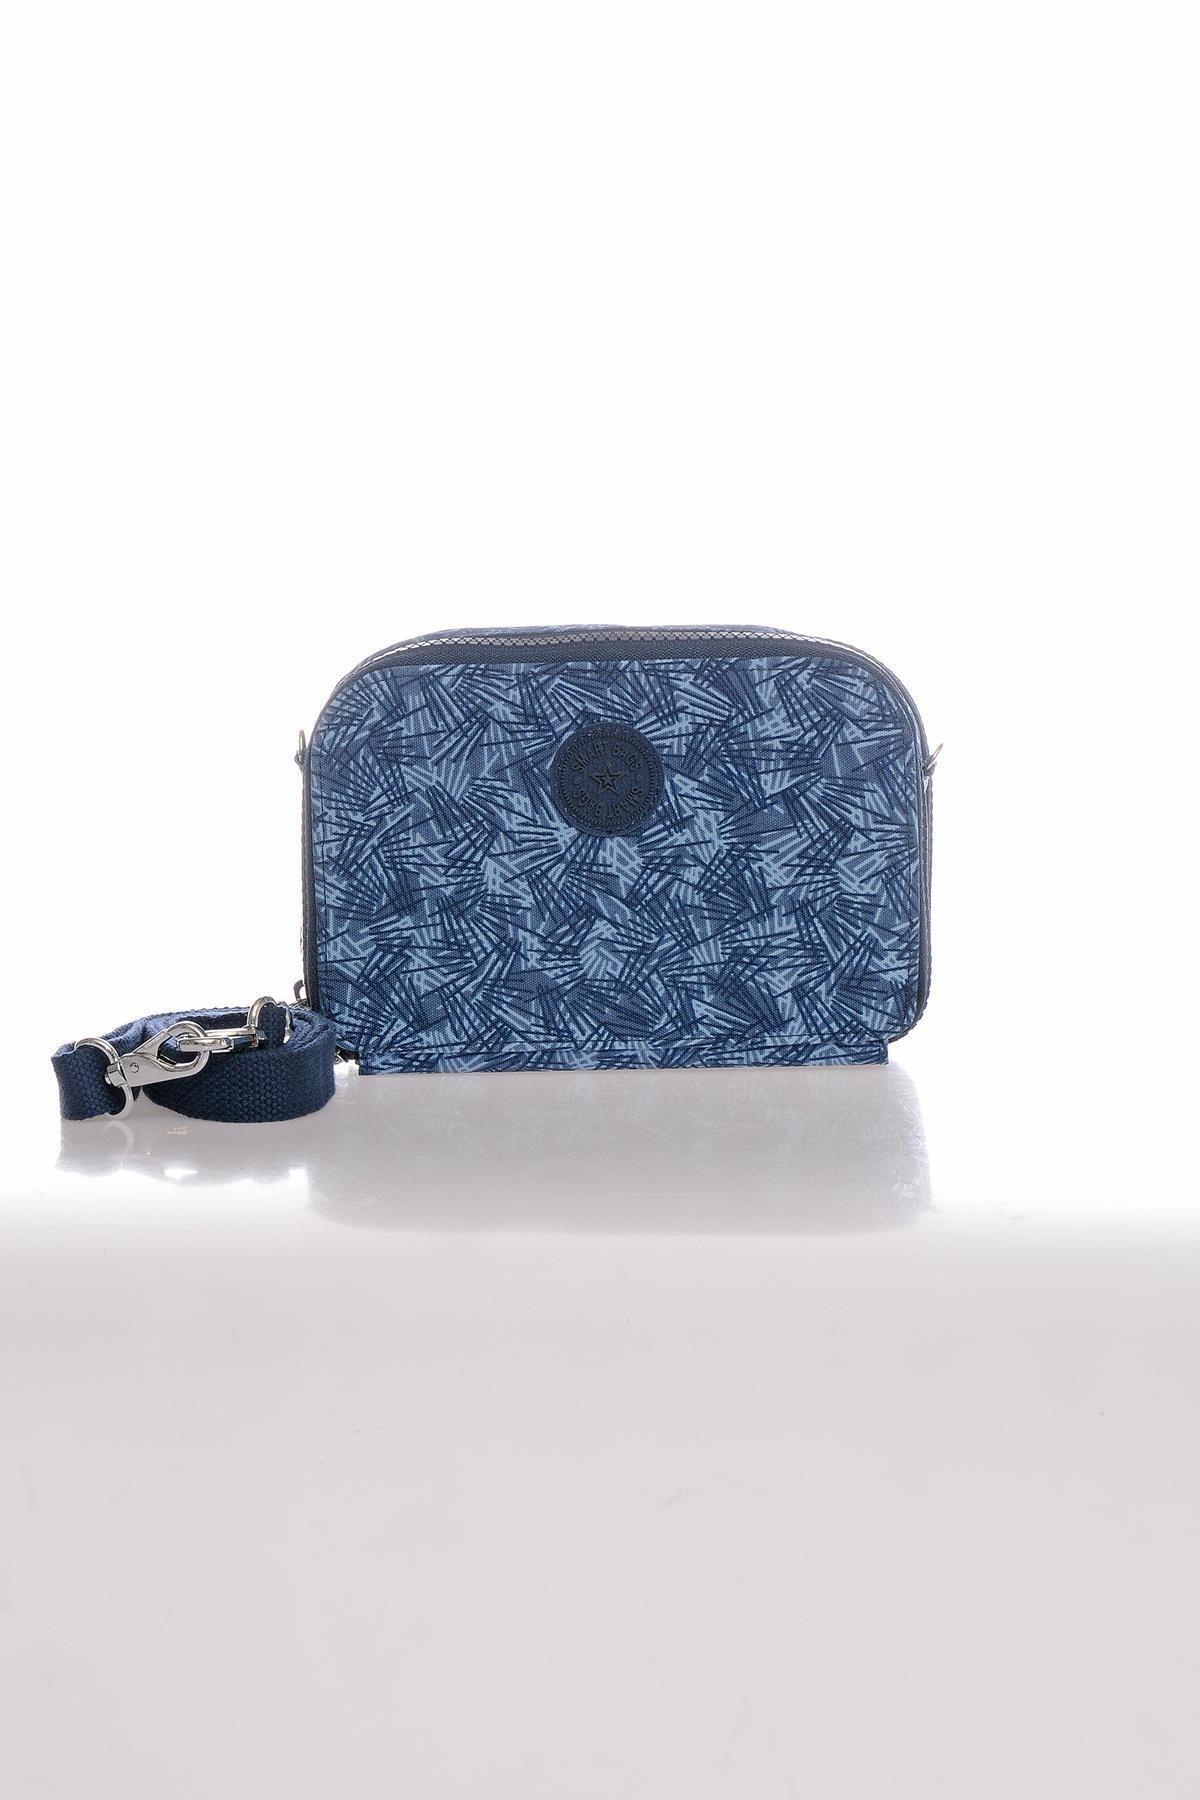 SMART BAGS Kadın Mavi/ Portföy Çanta Smb3038-0097 1